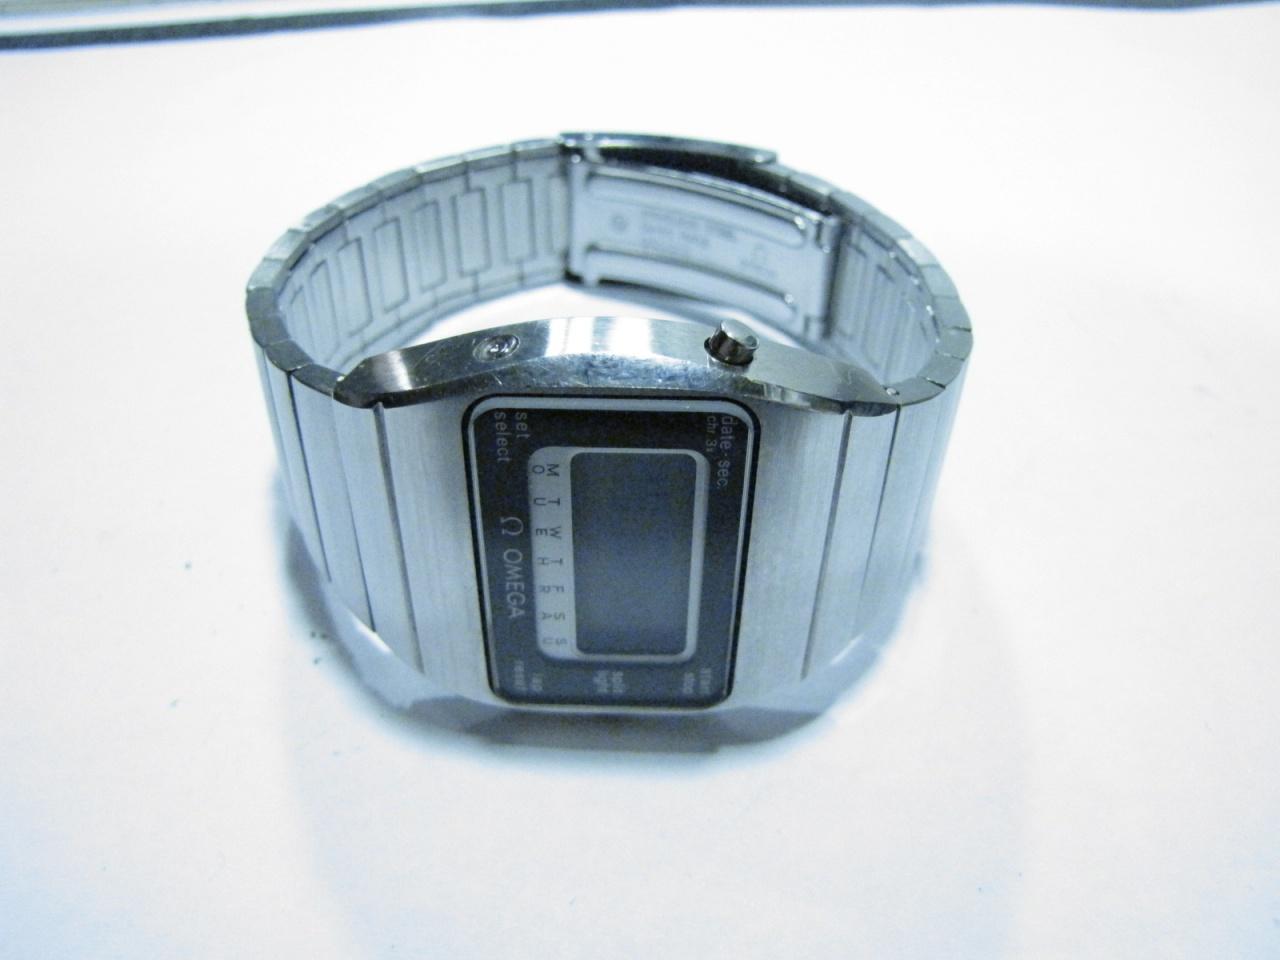 Omega Speedmaster Quartz Calibre Lcd 1620